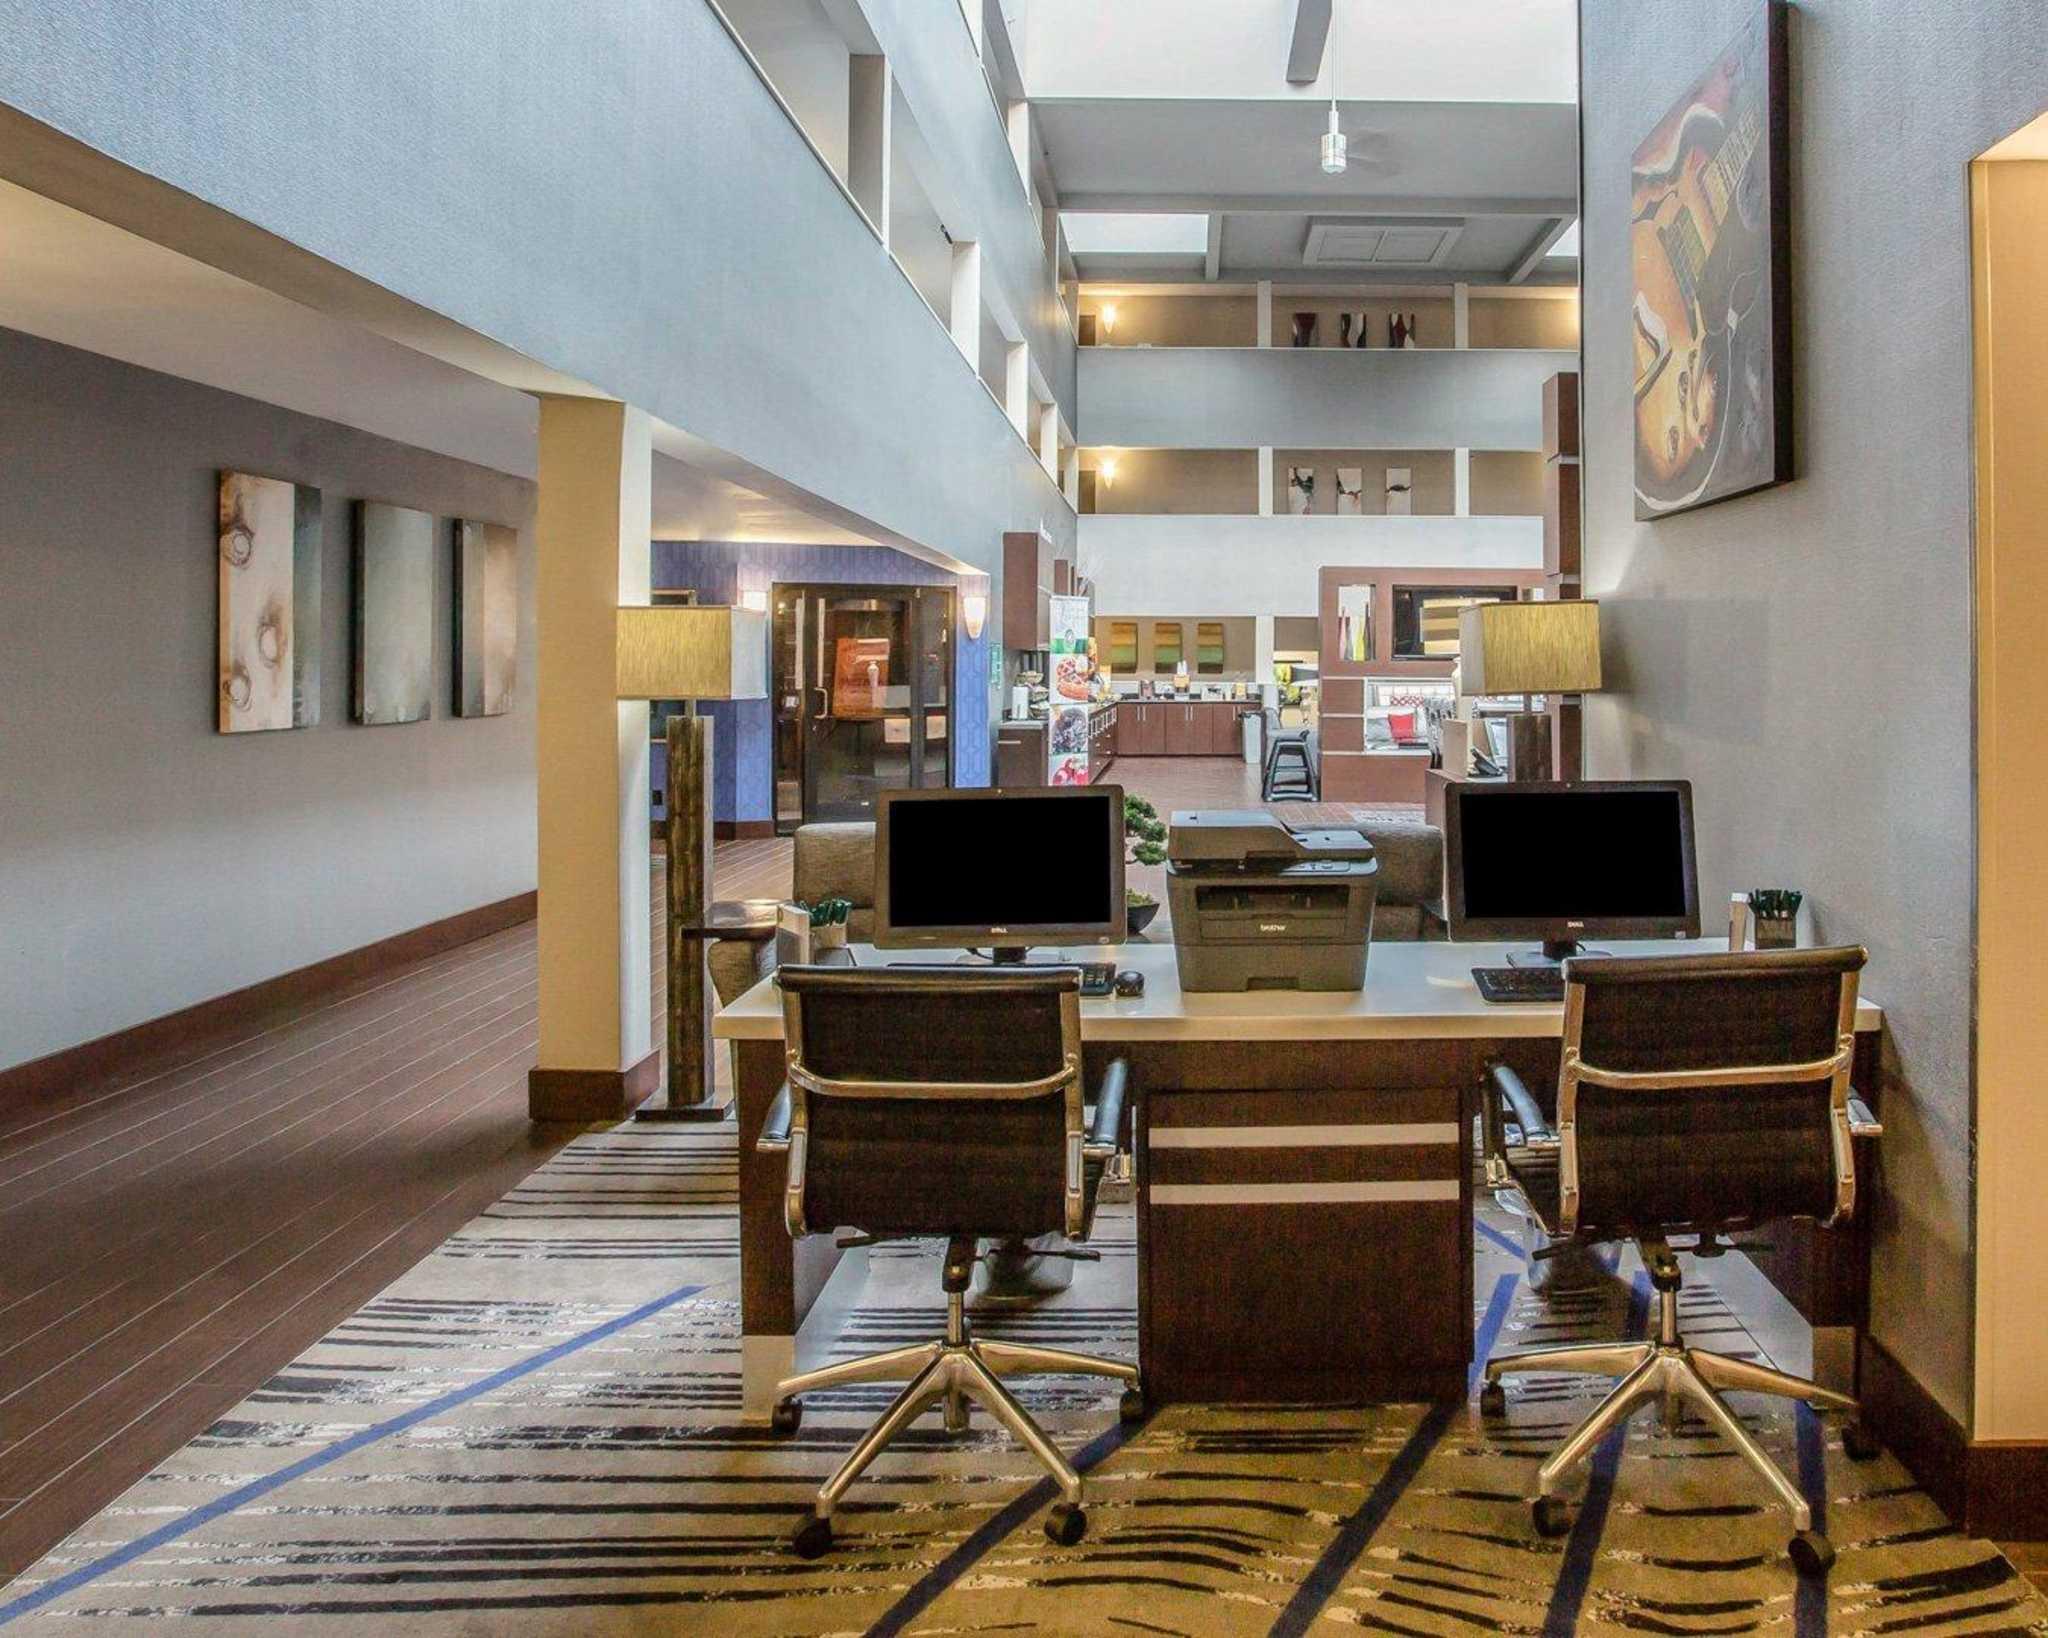 Quality suites nashville airport nashville tennessee tn for Hilton garden inn nashville airport